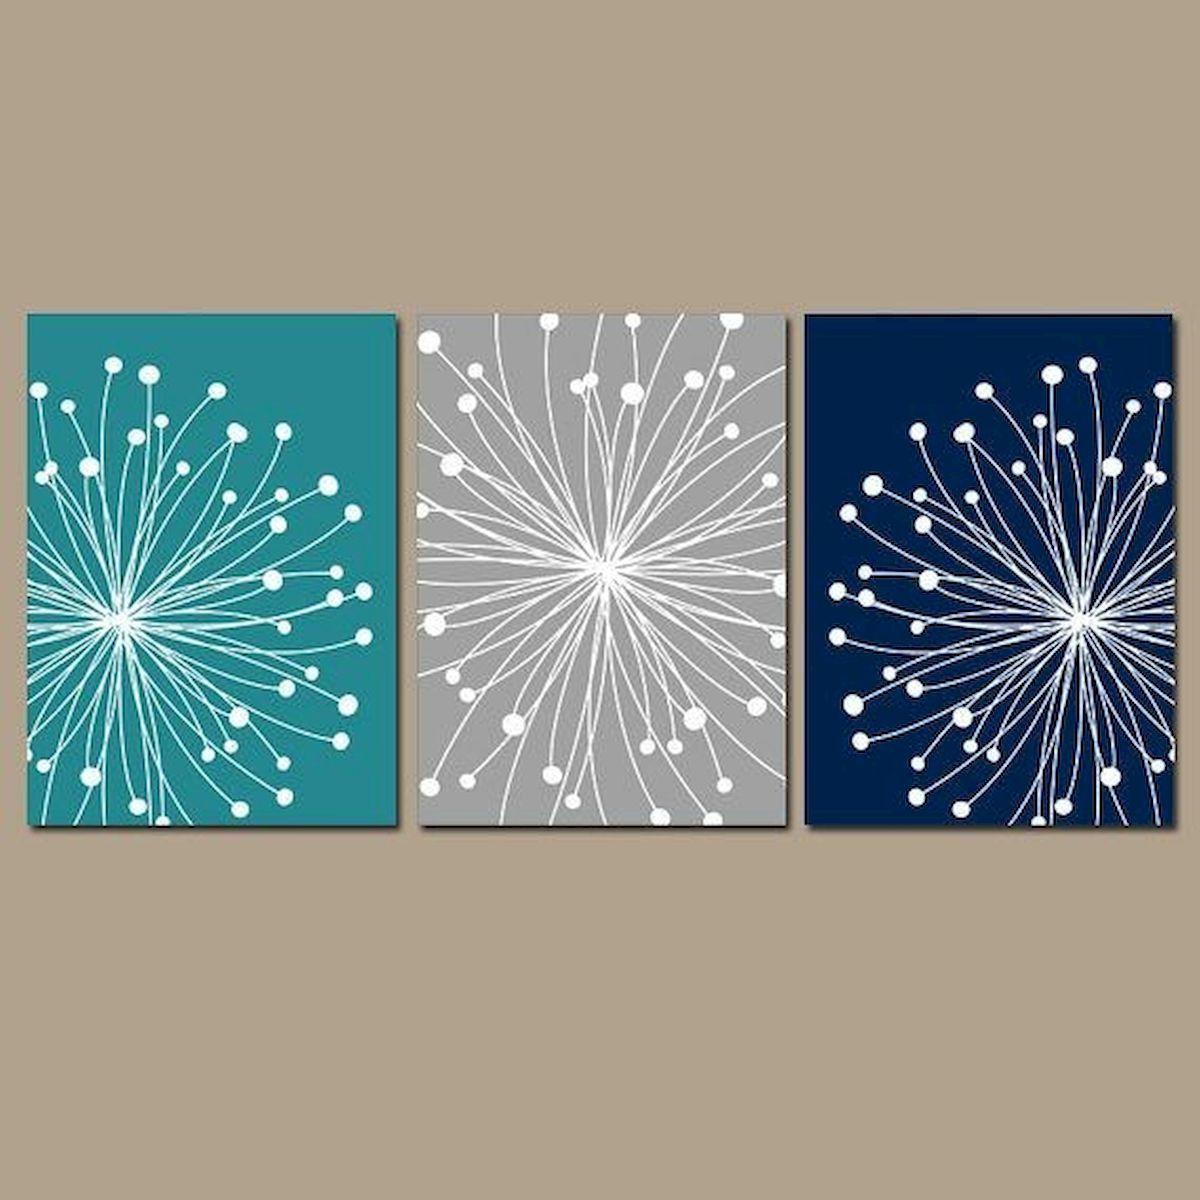 Three Piece Painting 3 Canvas Ideas Easy